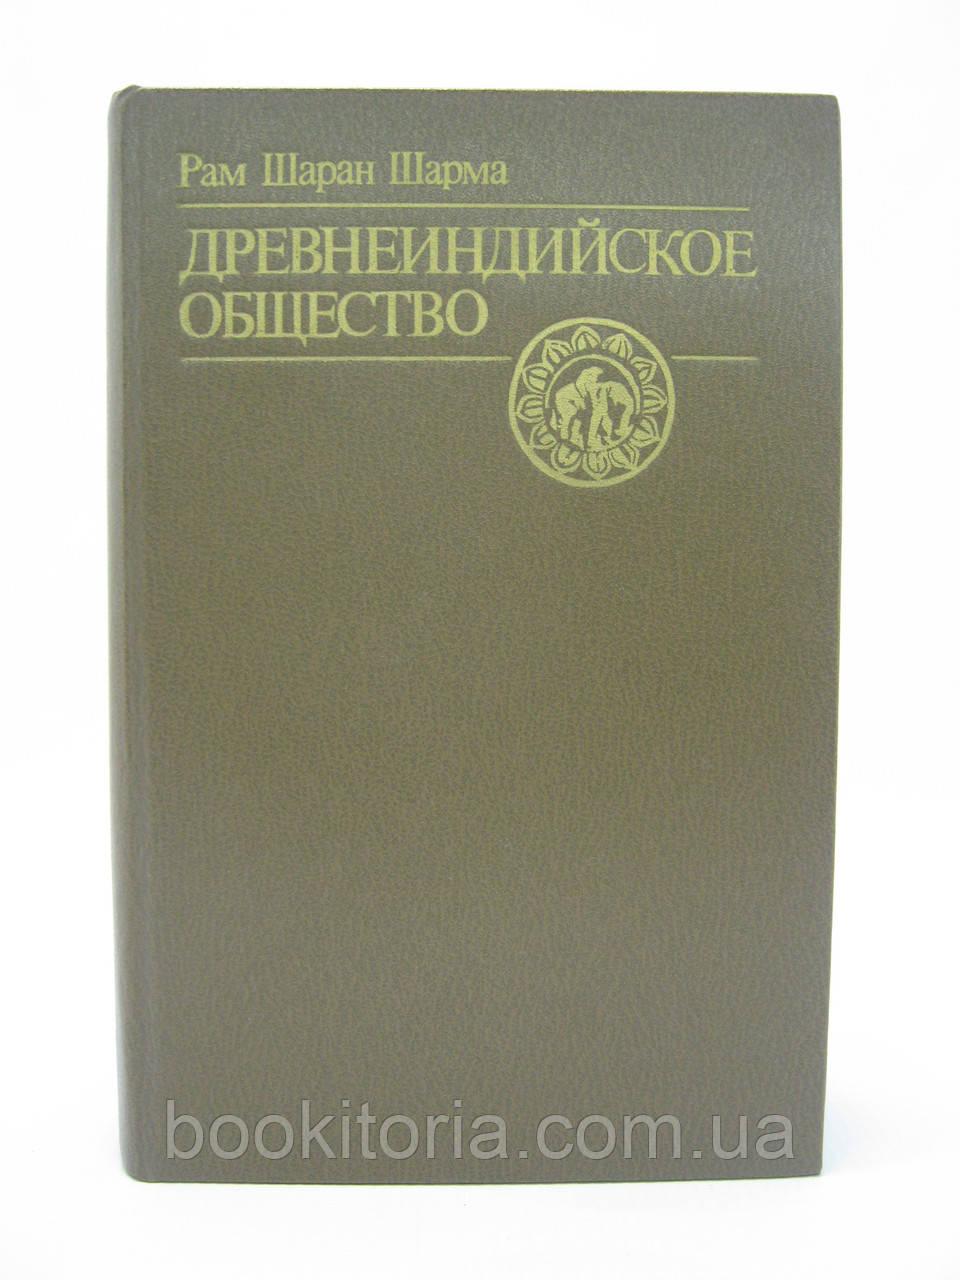 Рам Шаран Шарма. Древнеиндийское общество (б/у).